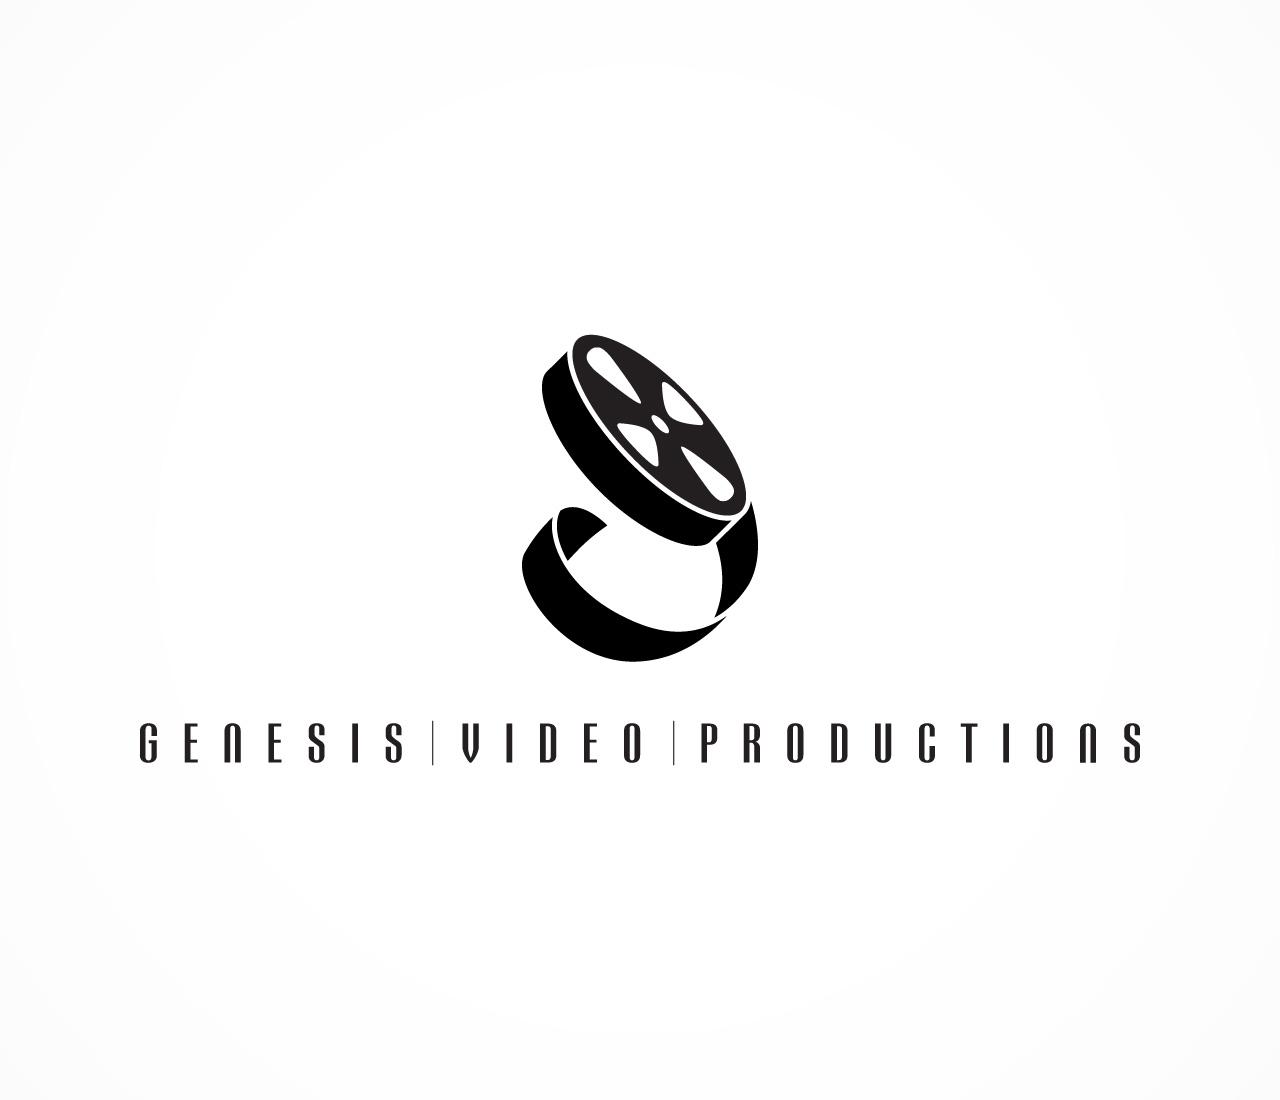 Genesis Video Productions